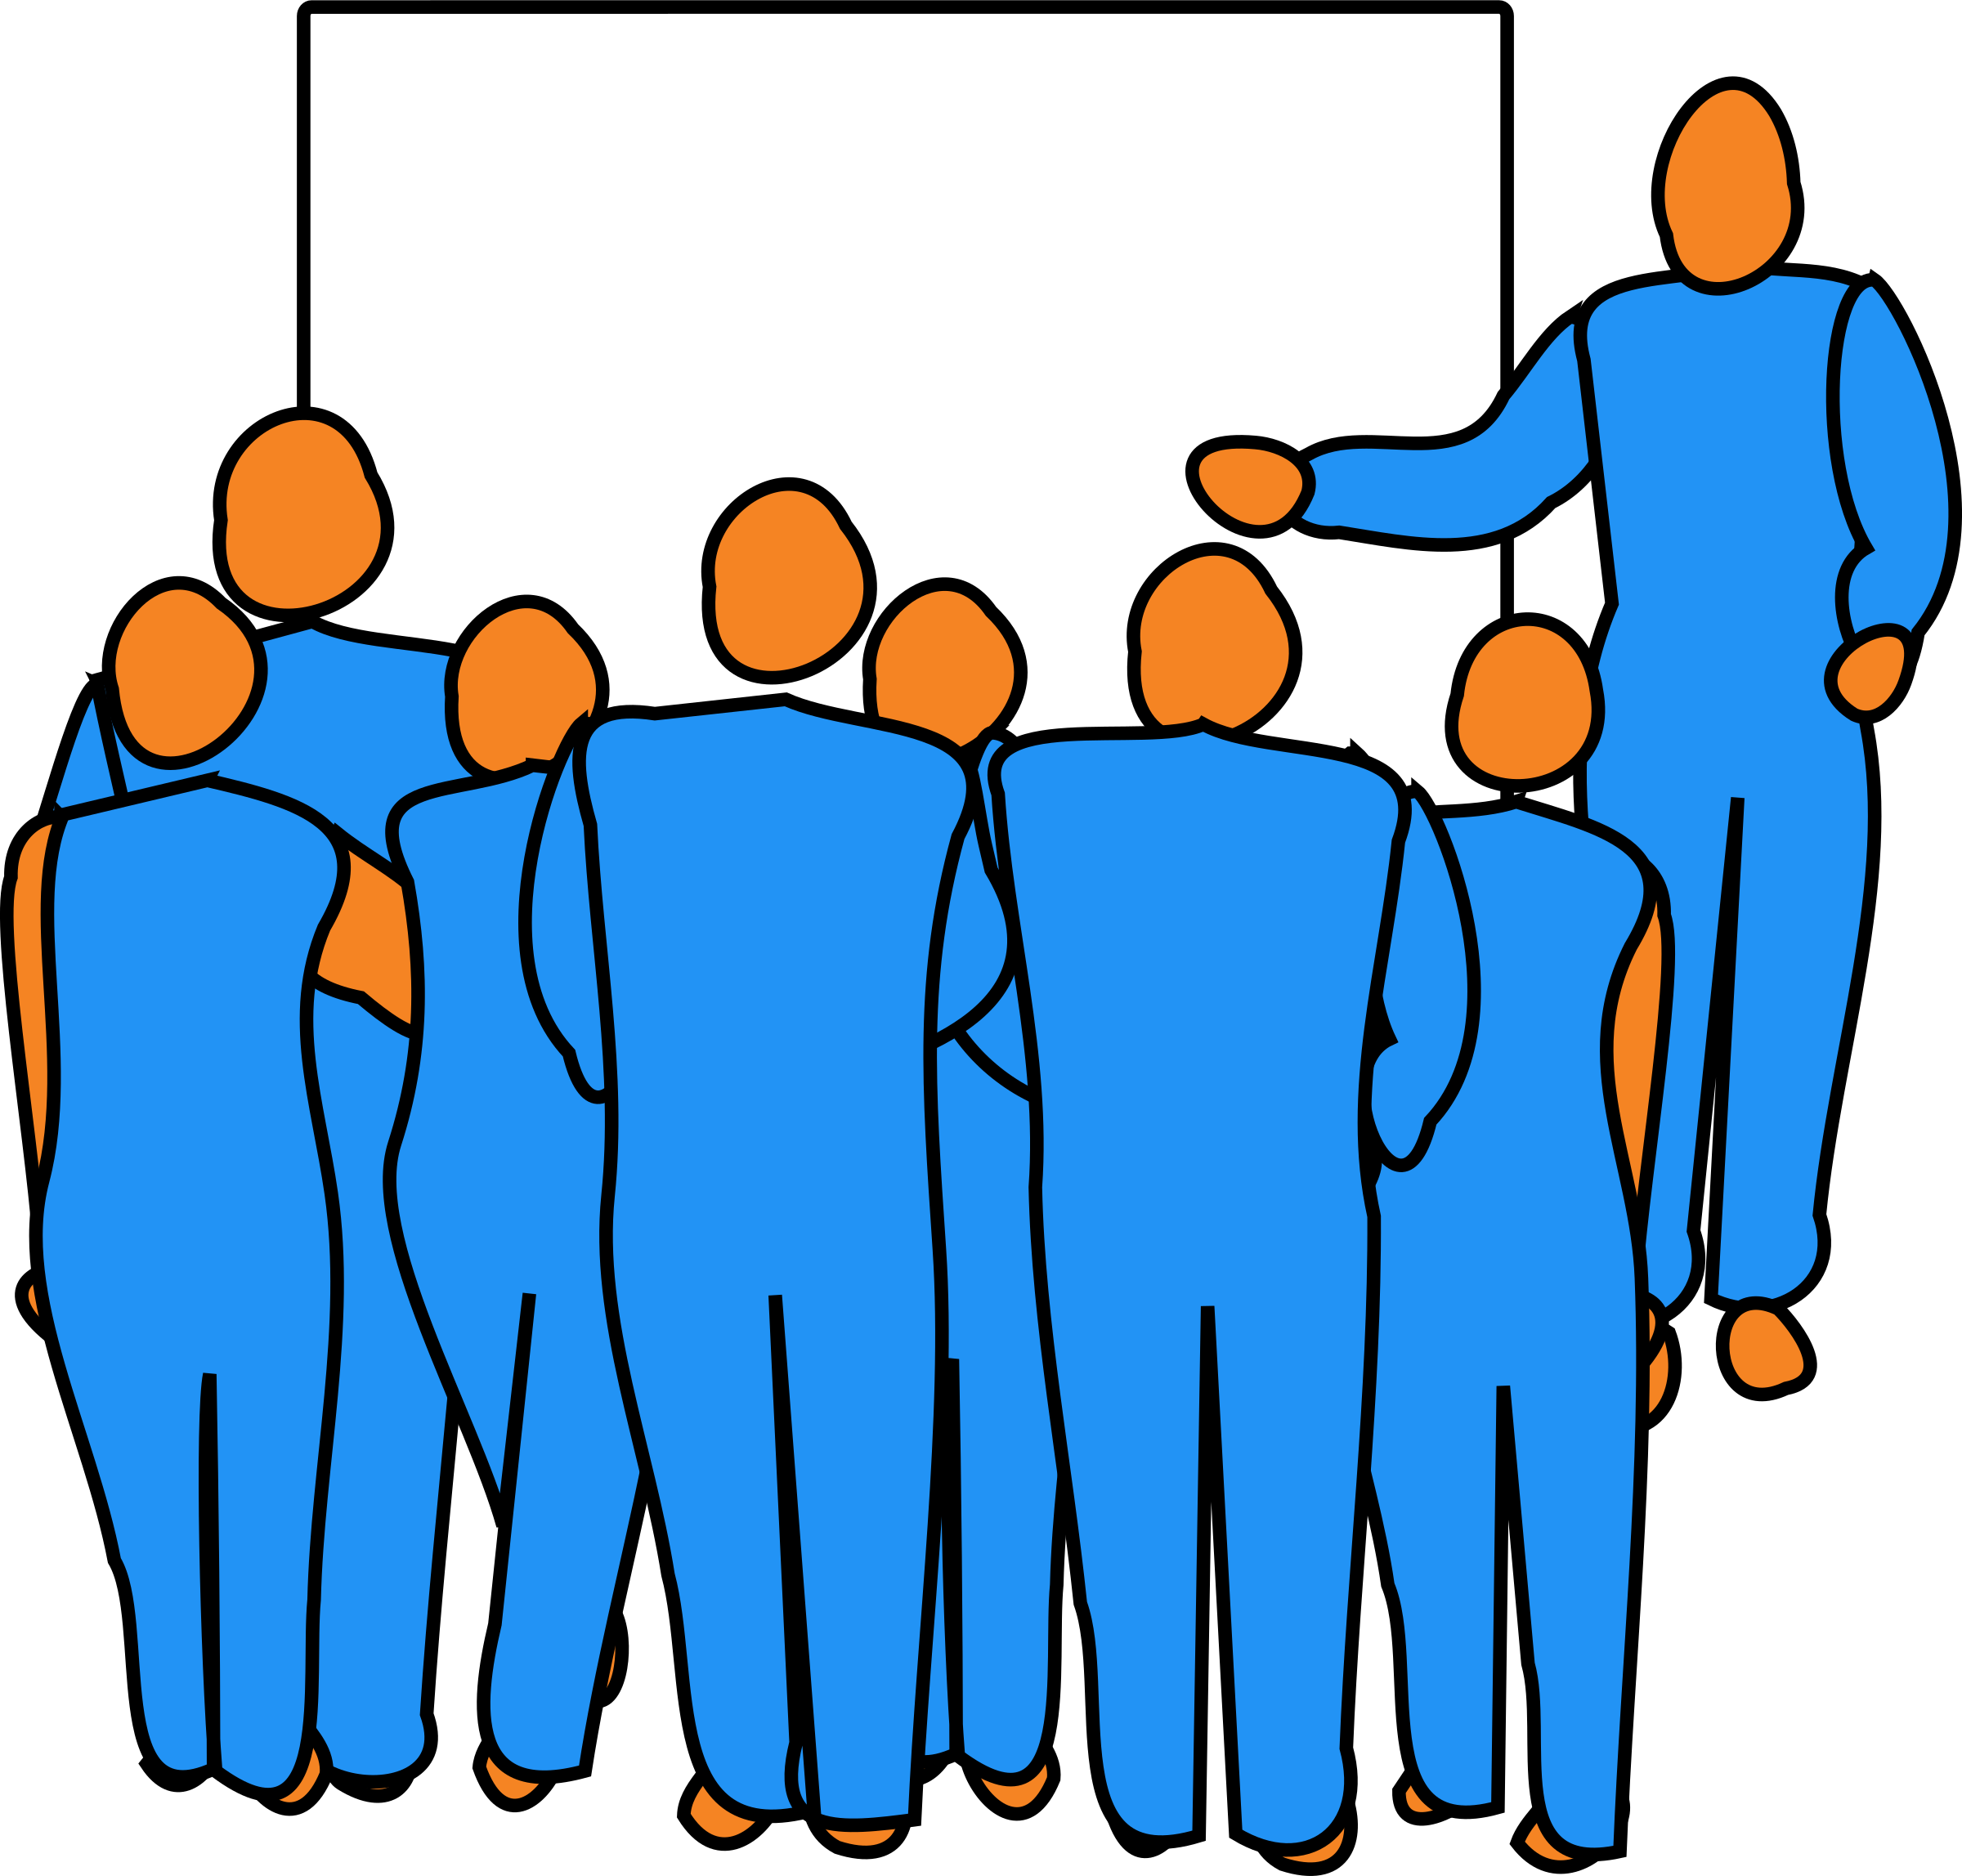 Presentation big image png. Male clipart lecturer